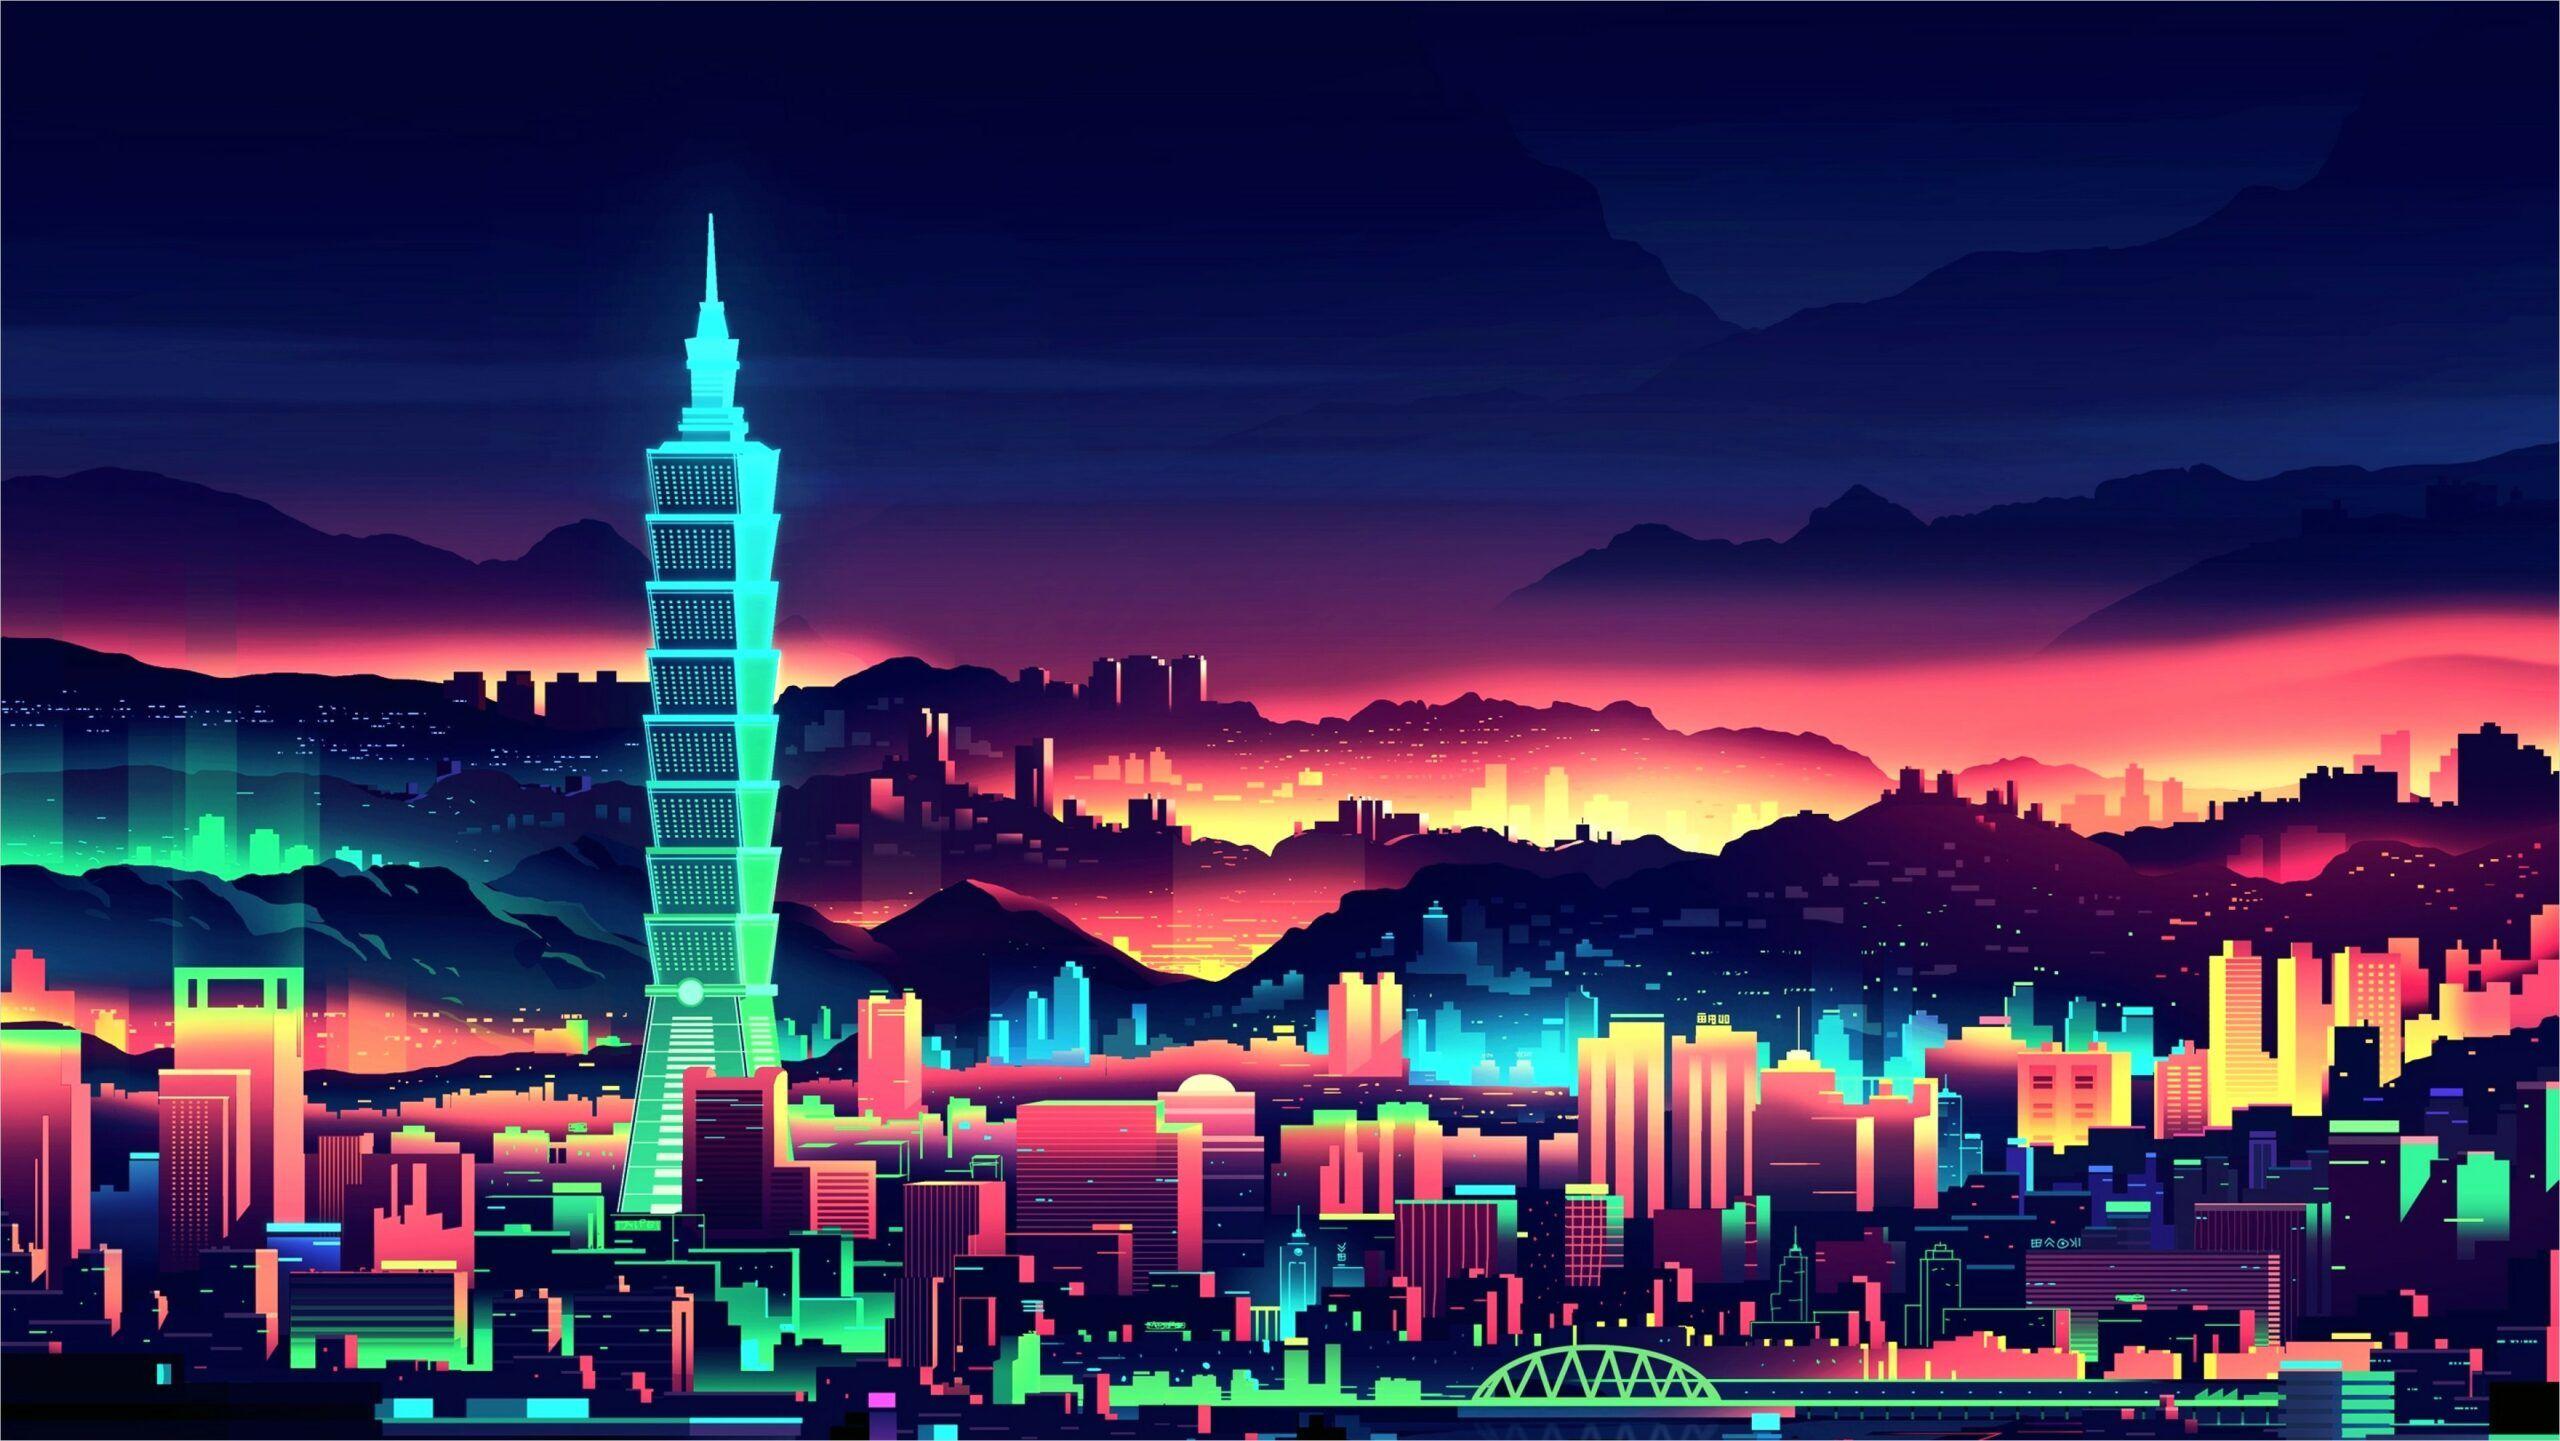 4k Neon City Wallpaper In 2020 City Wallpaper Neon Wallpaper Digital Wallpaper